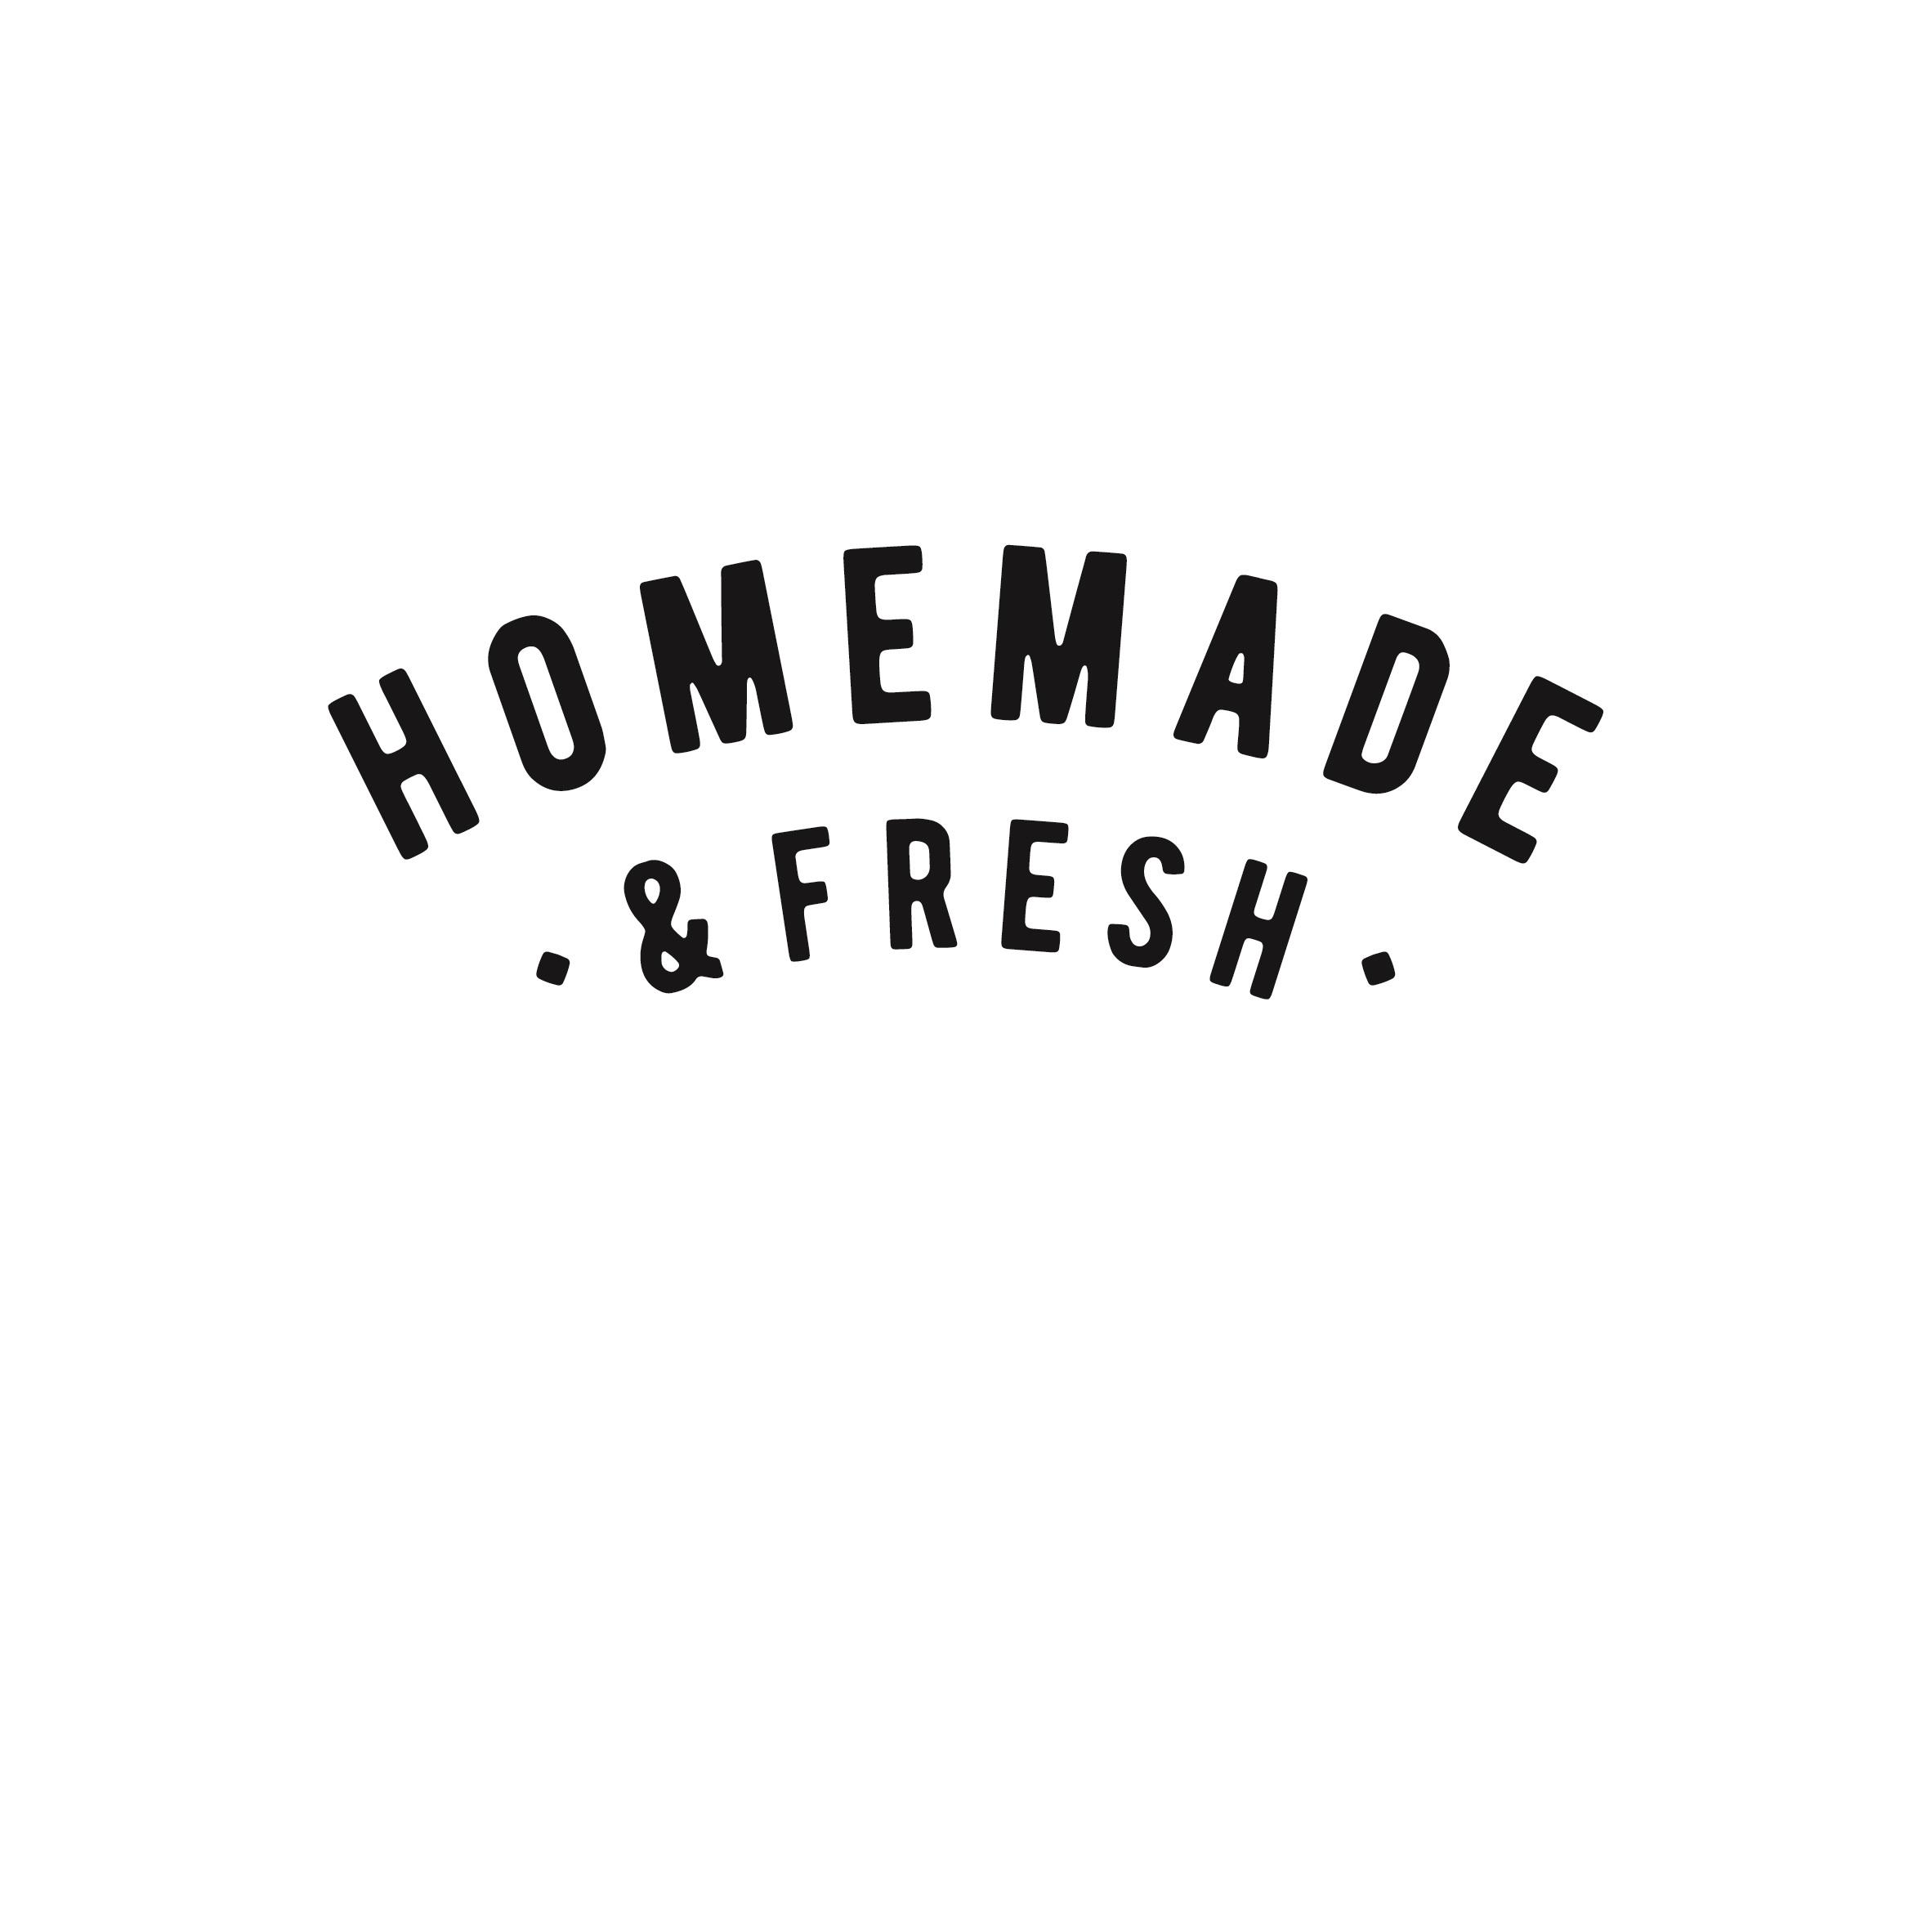 Homemade and fresh